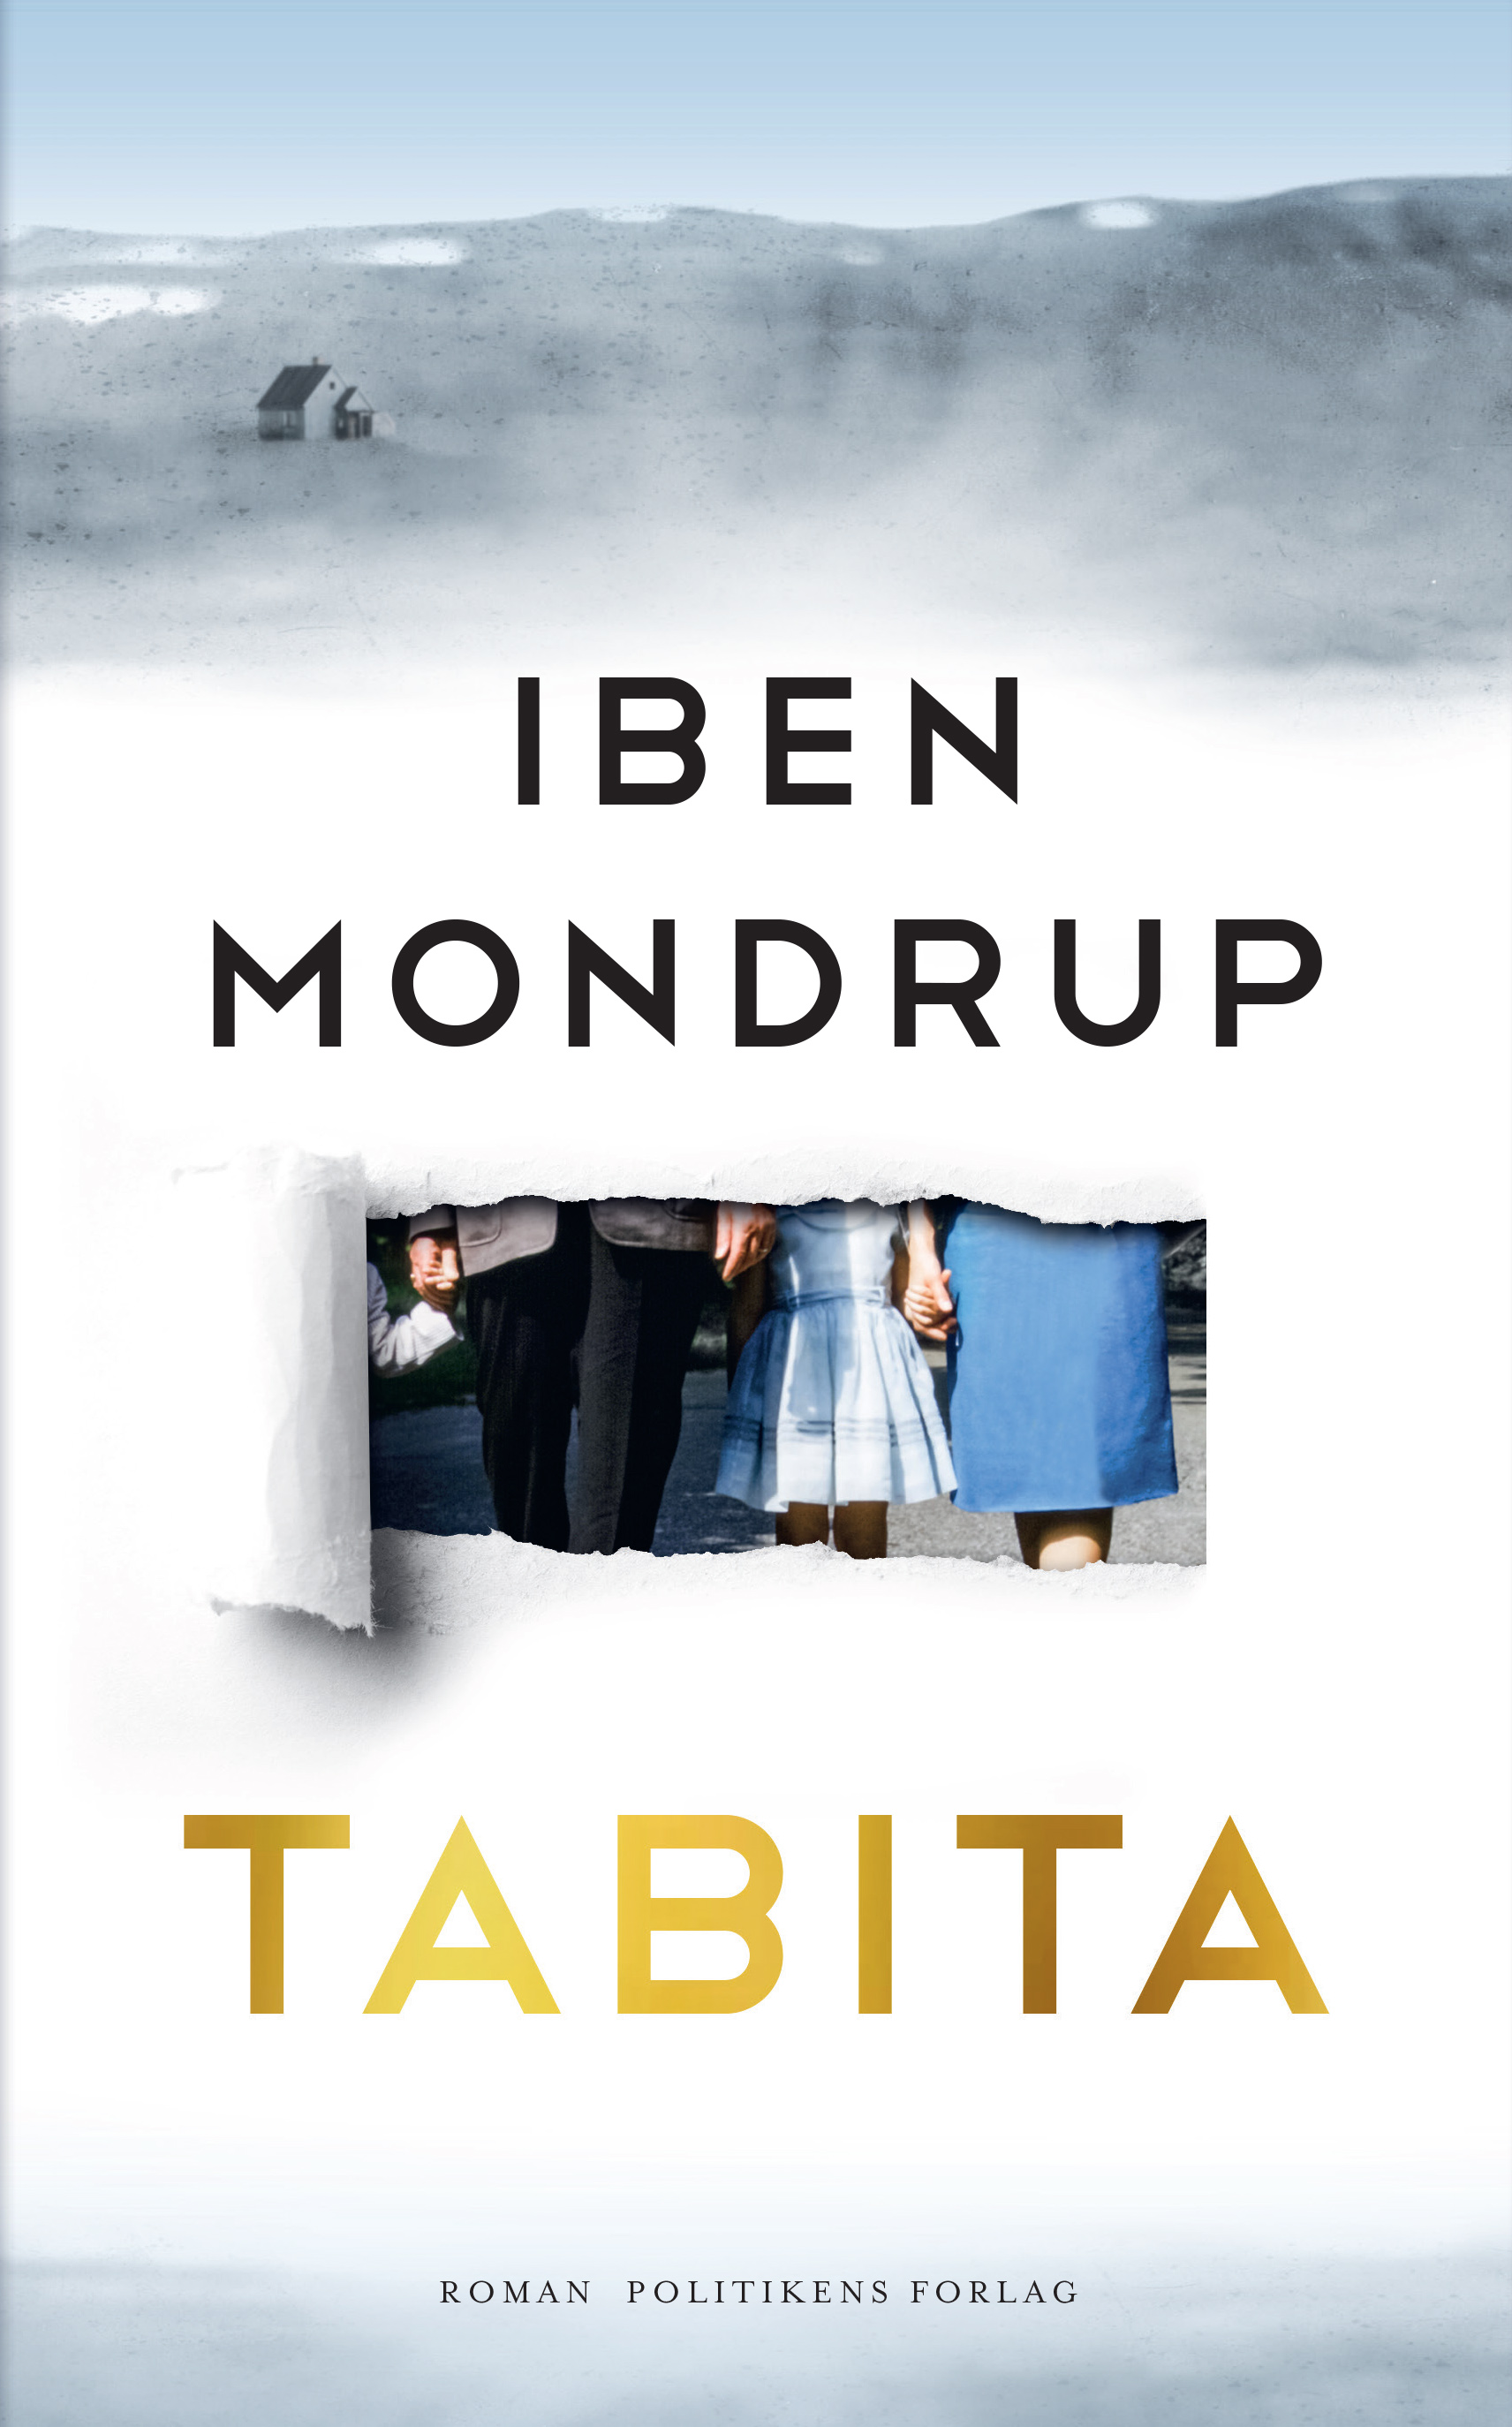 Tabita - Iben Mondrup - Bøger - Politikens Forlag - 9788740059175 - 15/1-2020